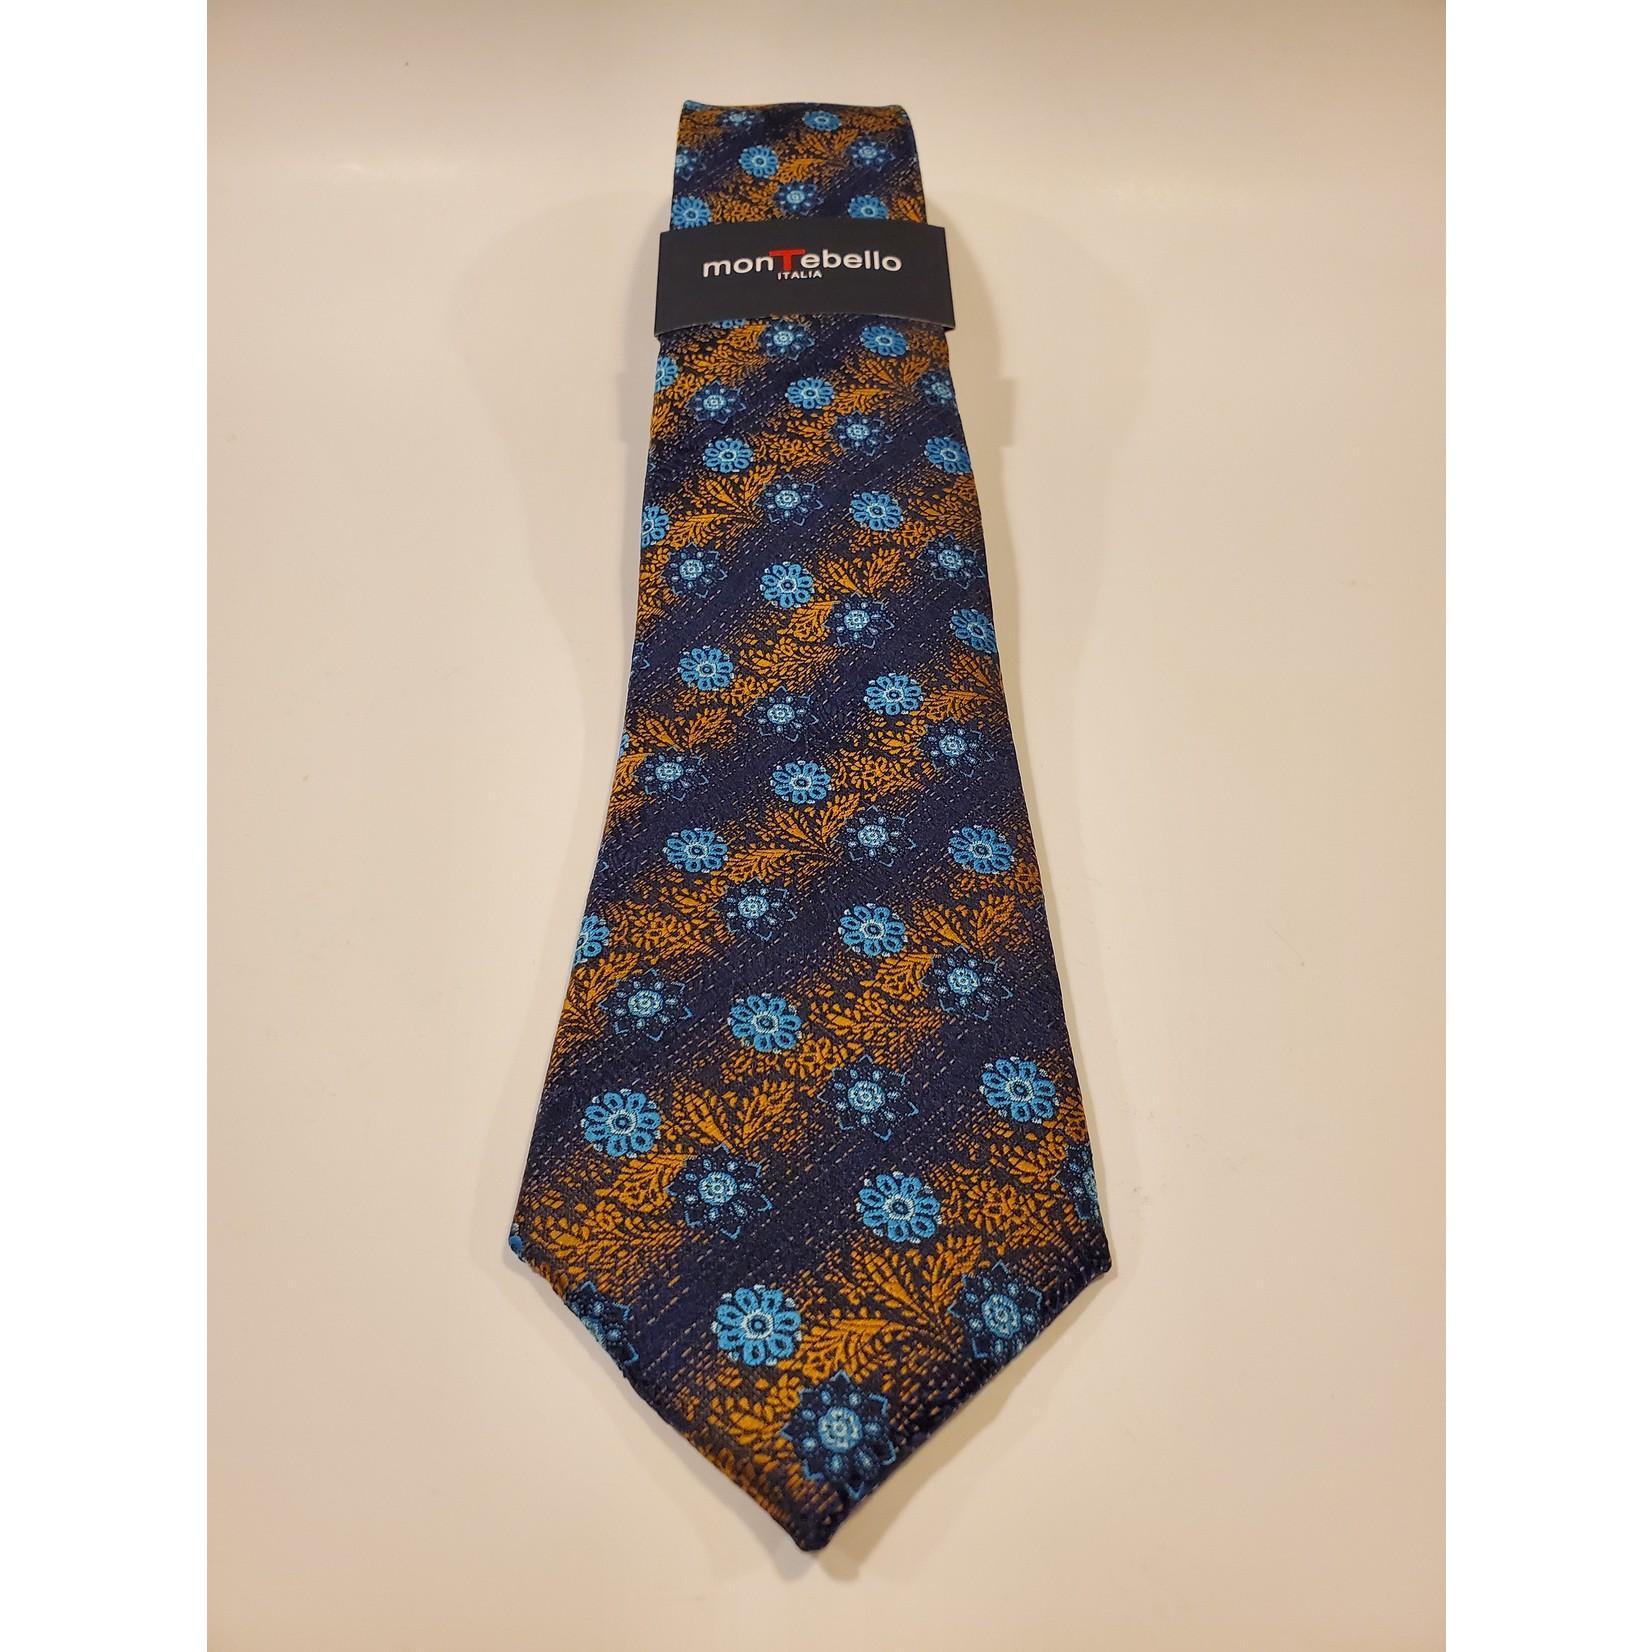 Montebello 1603 Jacquard Silk Tie - Blue Floral Pattern